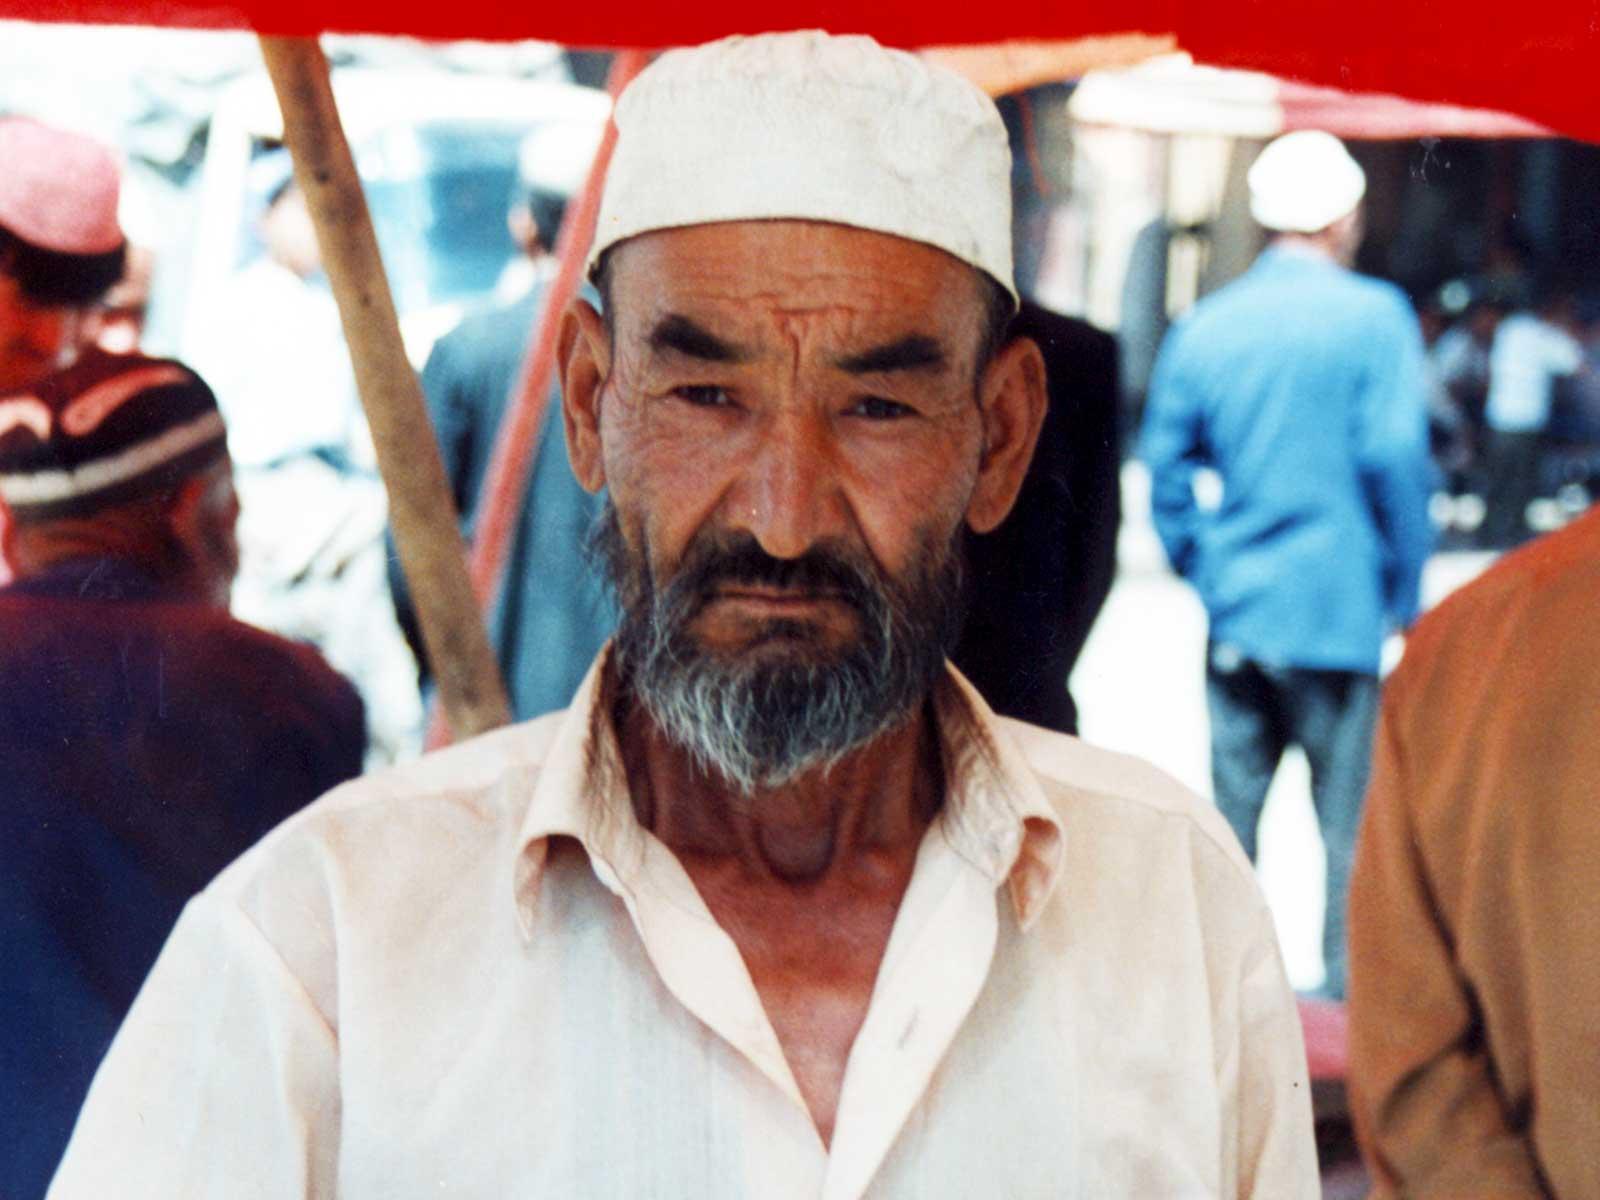 Tobacco seller - Kashgar China - Silk Road Photo Journal - Steven Andrew Martin - University of Hawaii Study Abroad